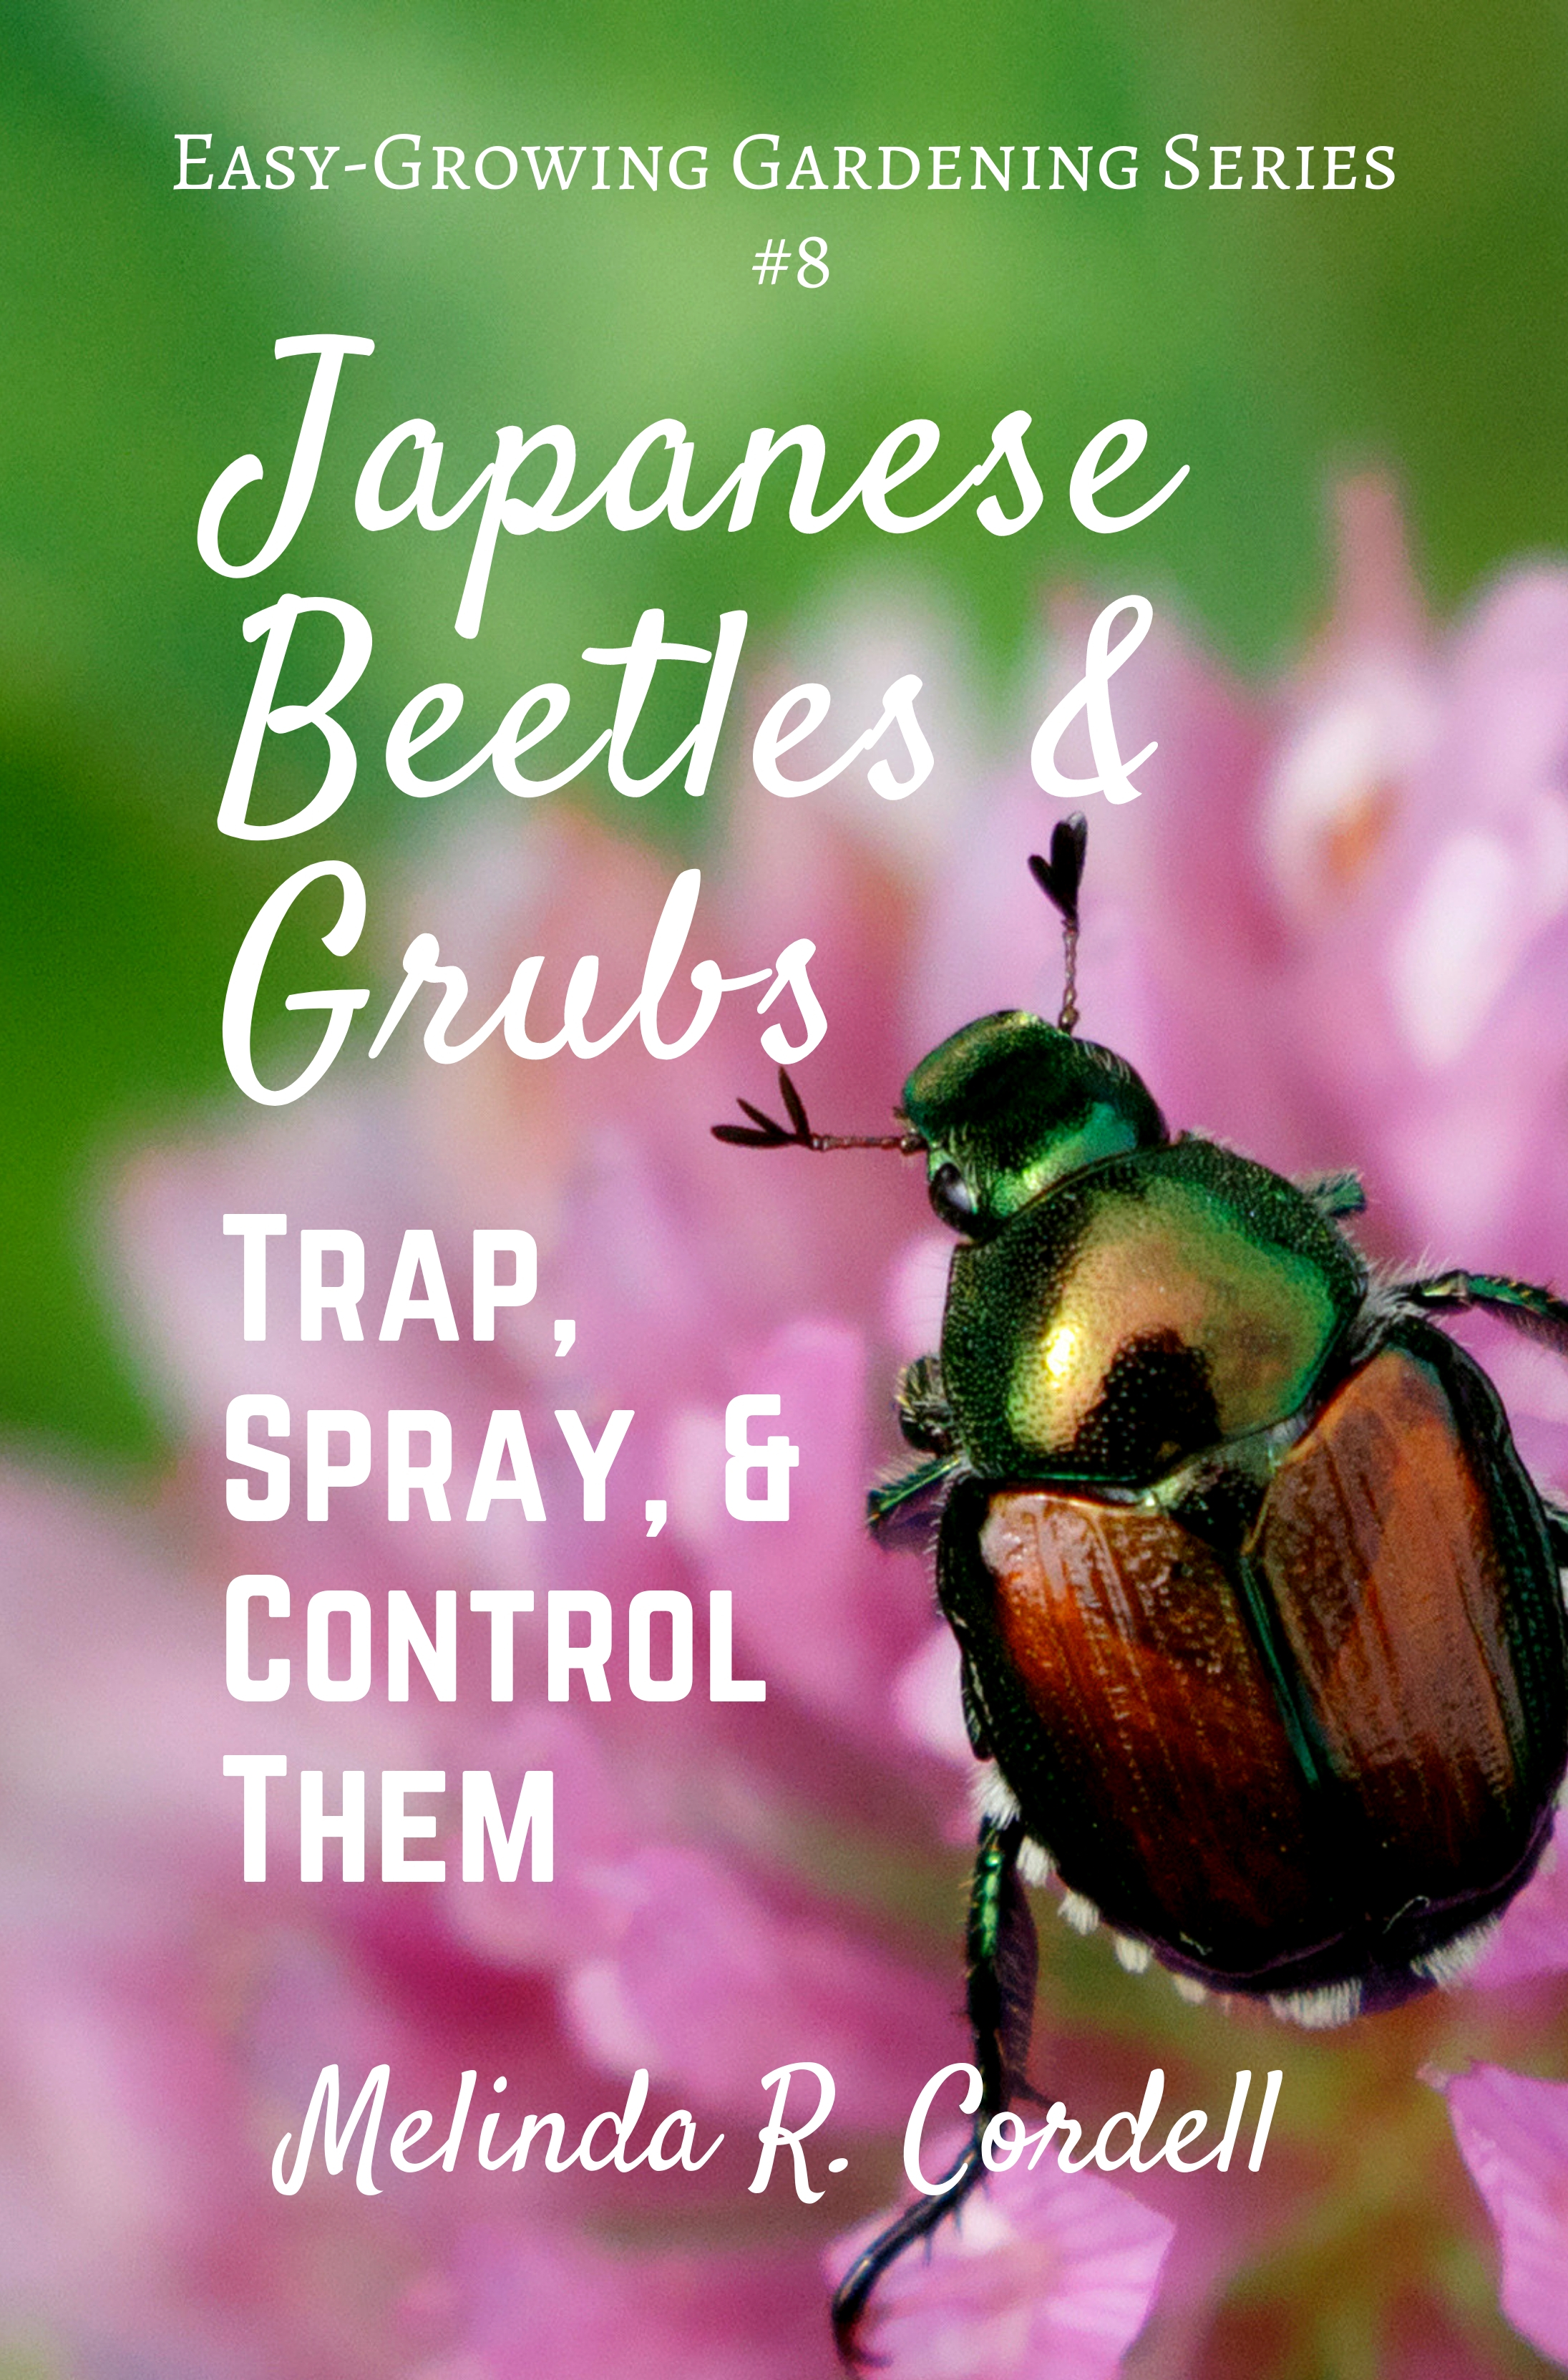 Japanese Beetles and Grubs